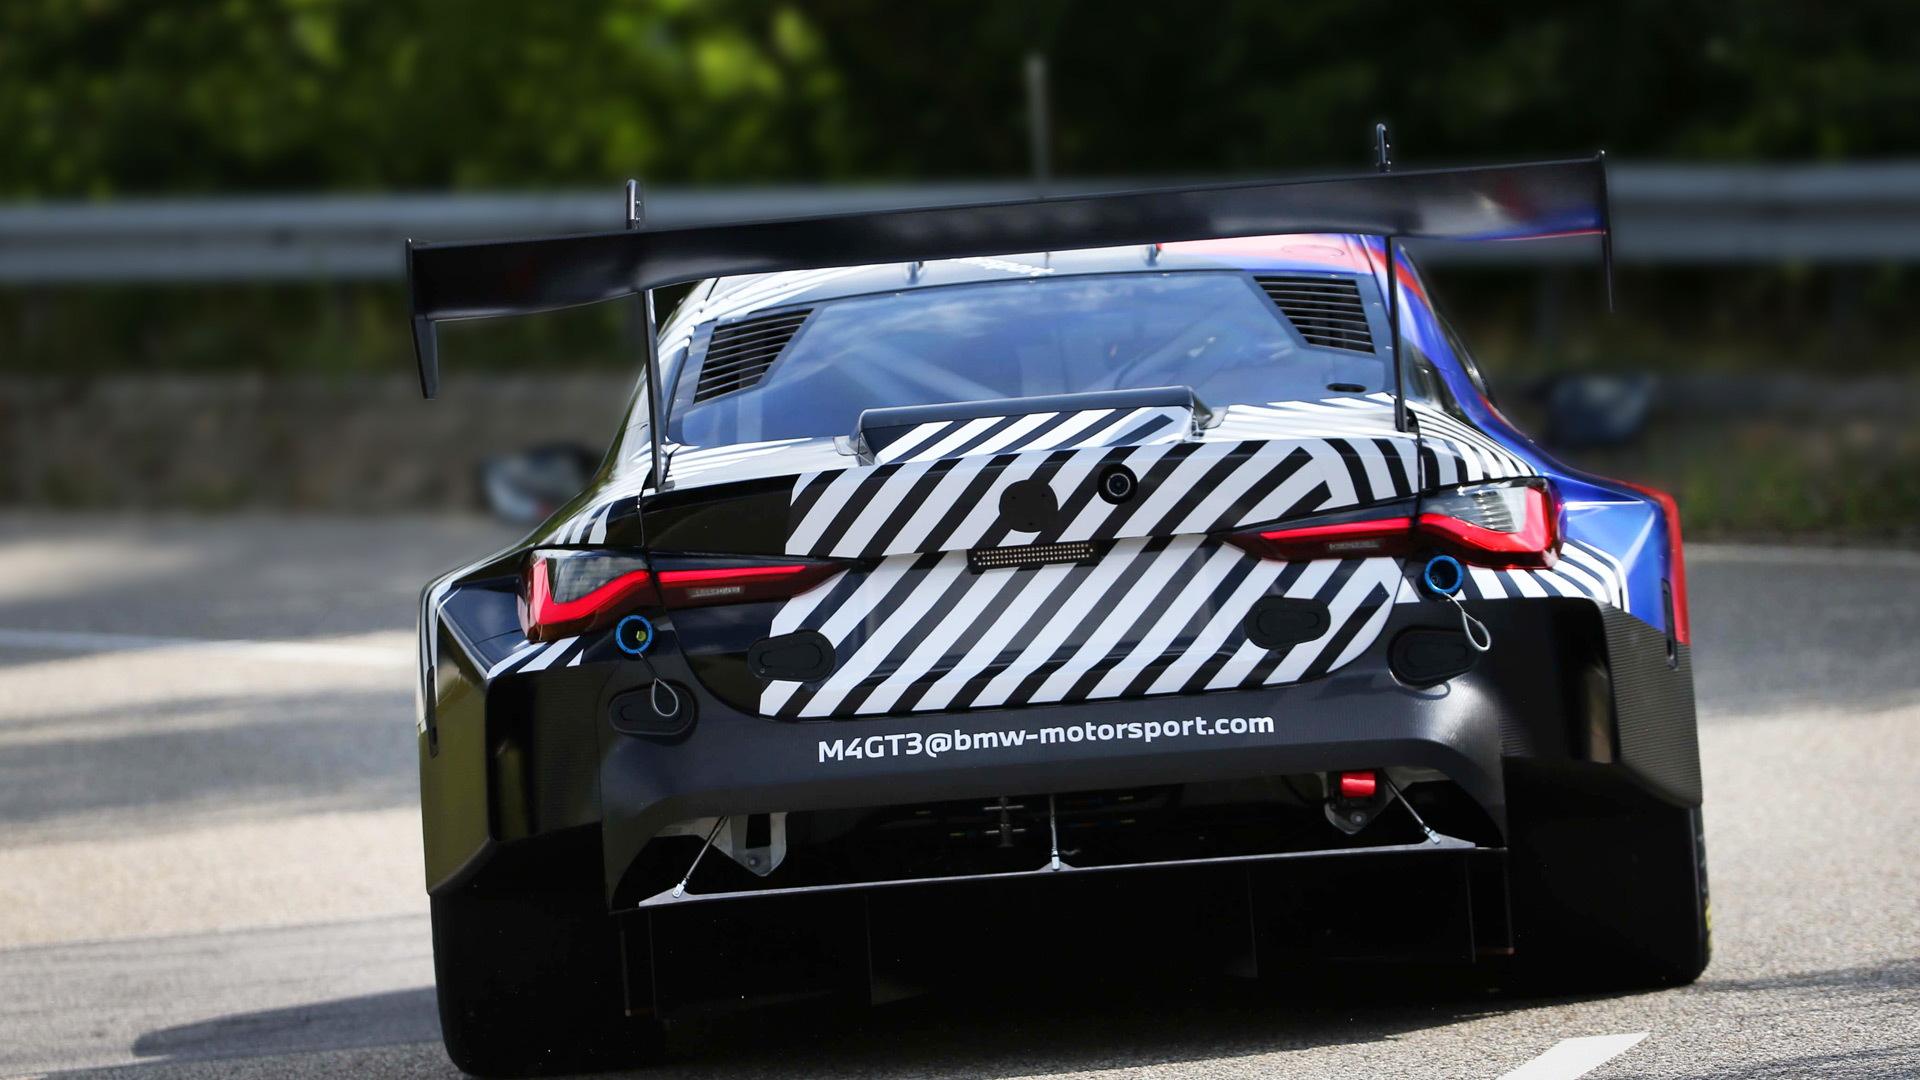 Teaser for 2022 BMW M4 GT3 race car